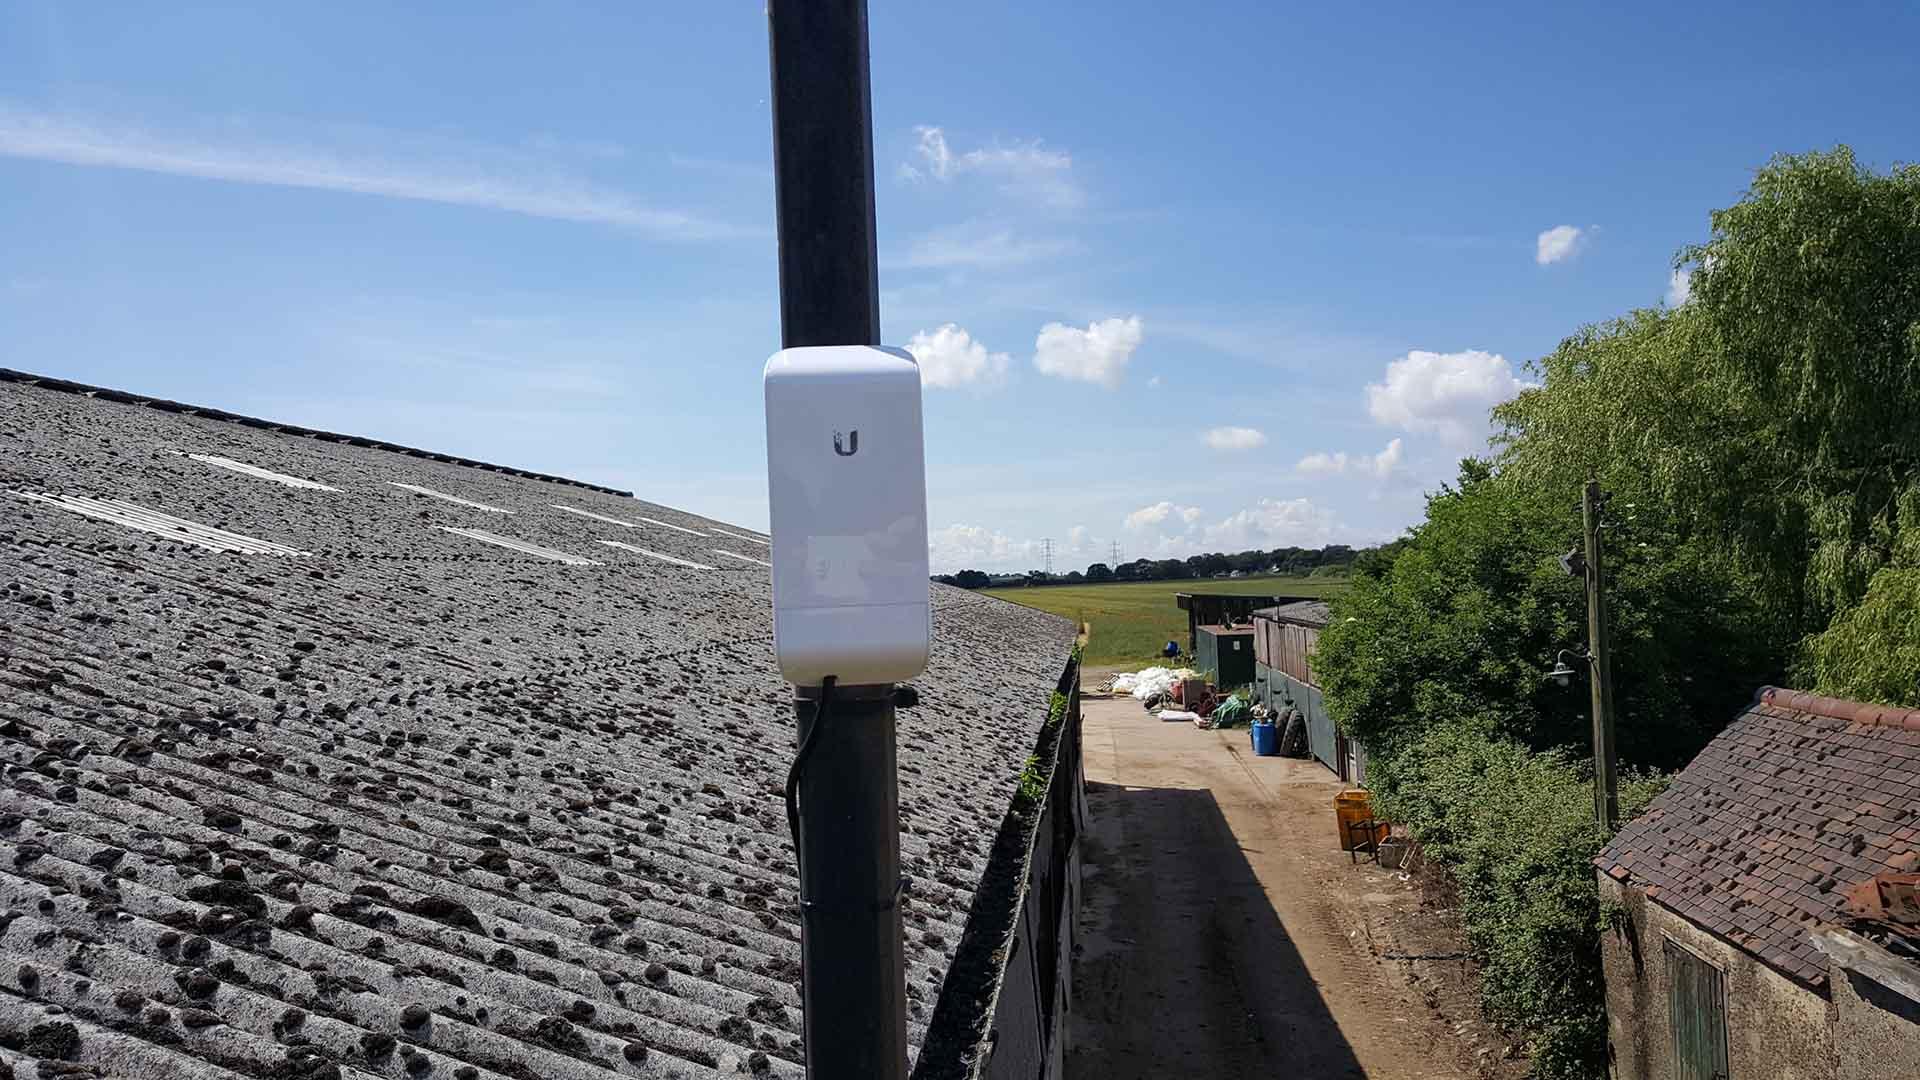 CCTV Installation in an Essex Farm